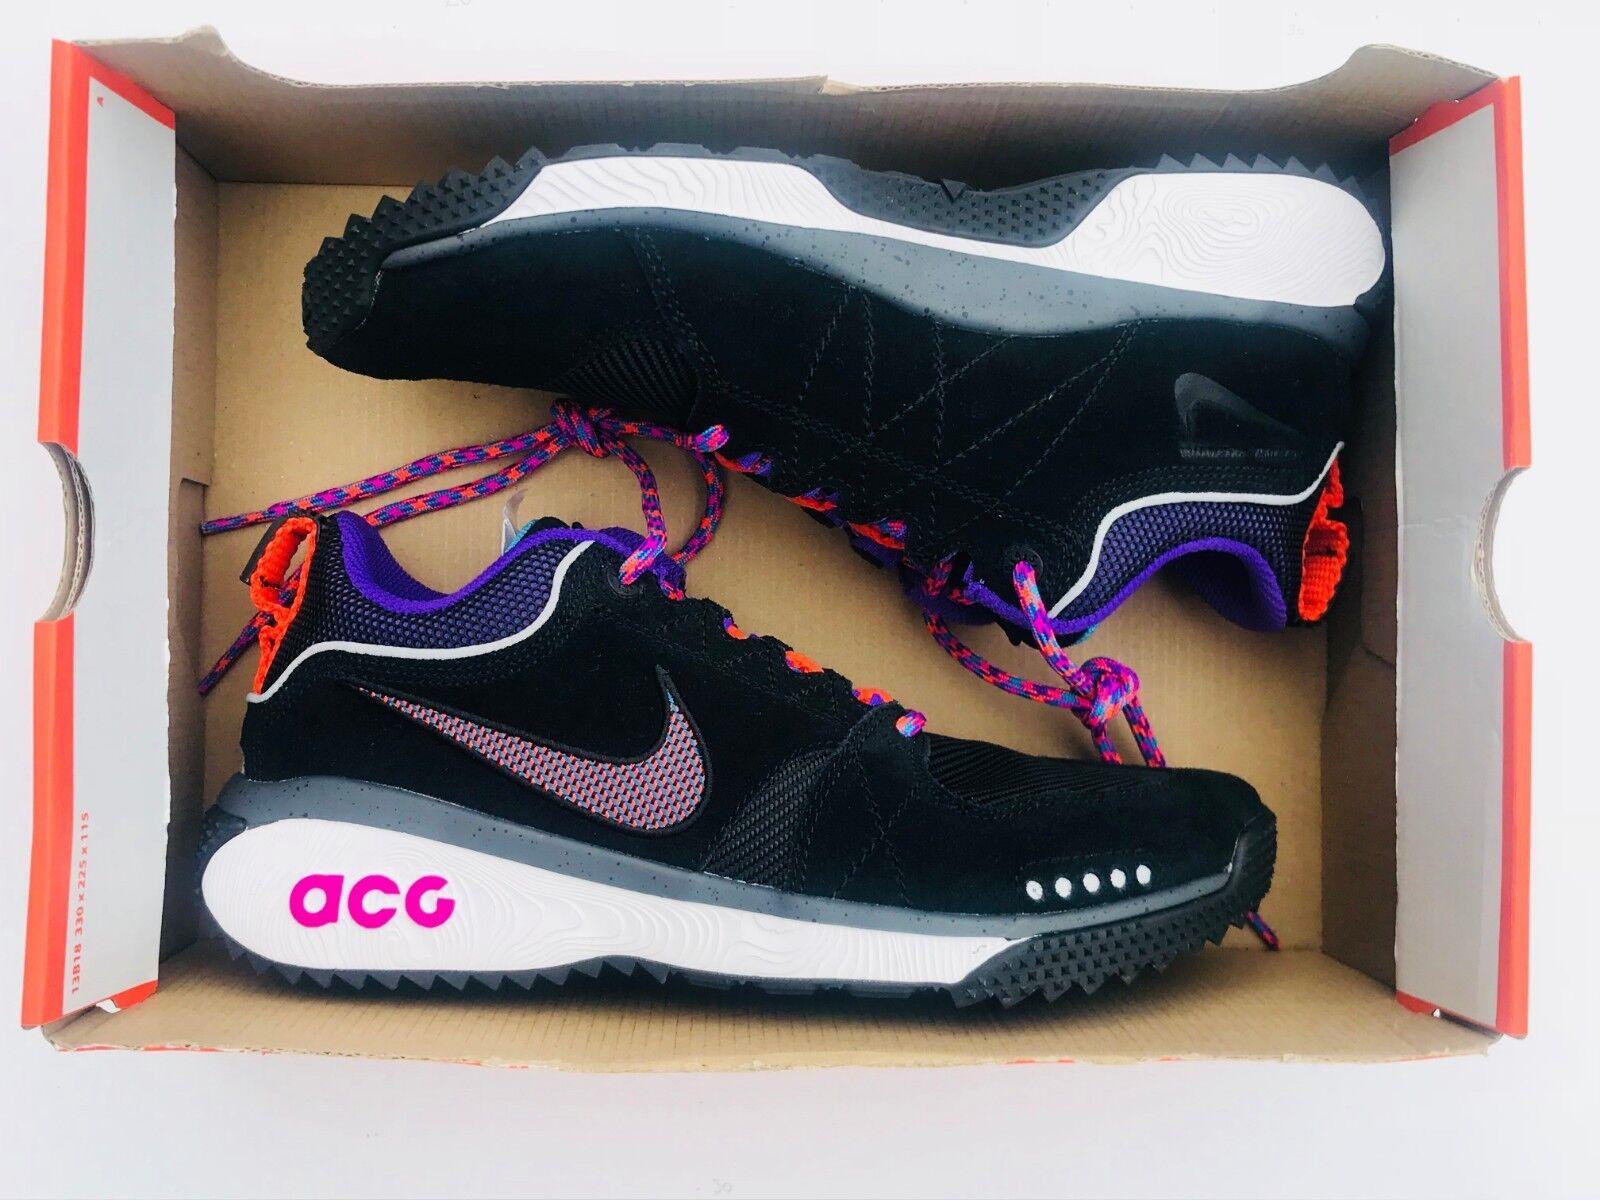 Nike ACG Dog Mountain Nero Grey Grape AQ0916-001 Uomo Sz 8.5, Donna Sz 10